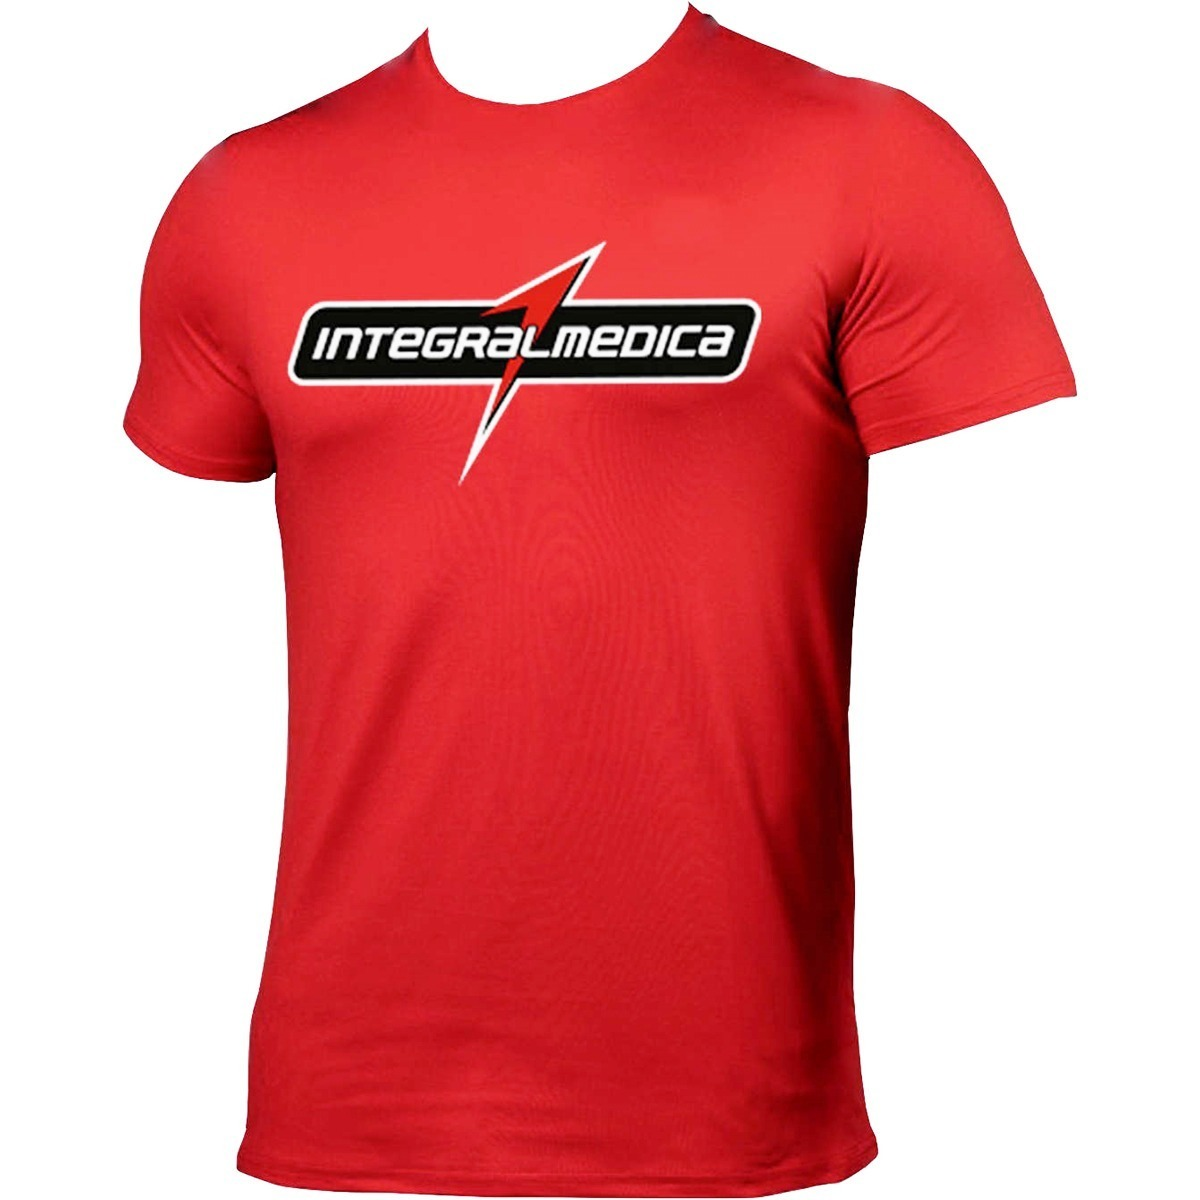 cf8581ee3e camiseta vermelha masculina dry fit - integralmedica. Carregando zoom.